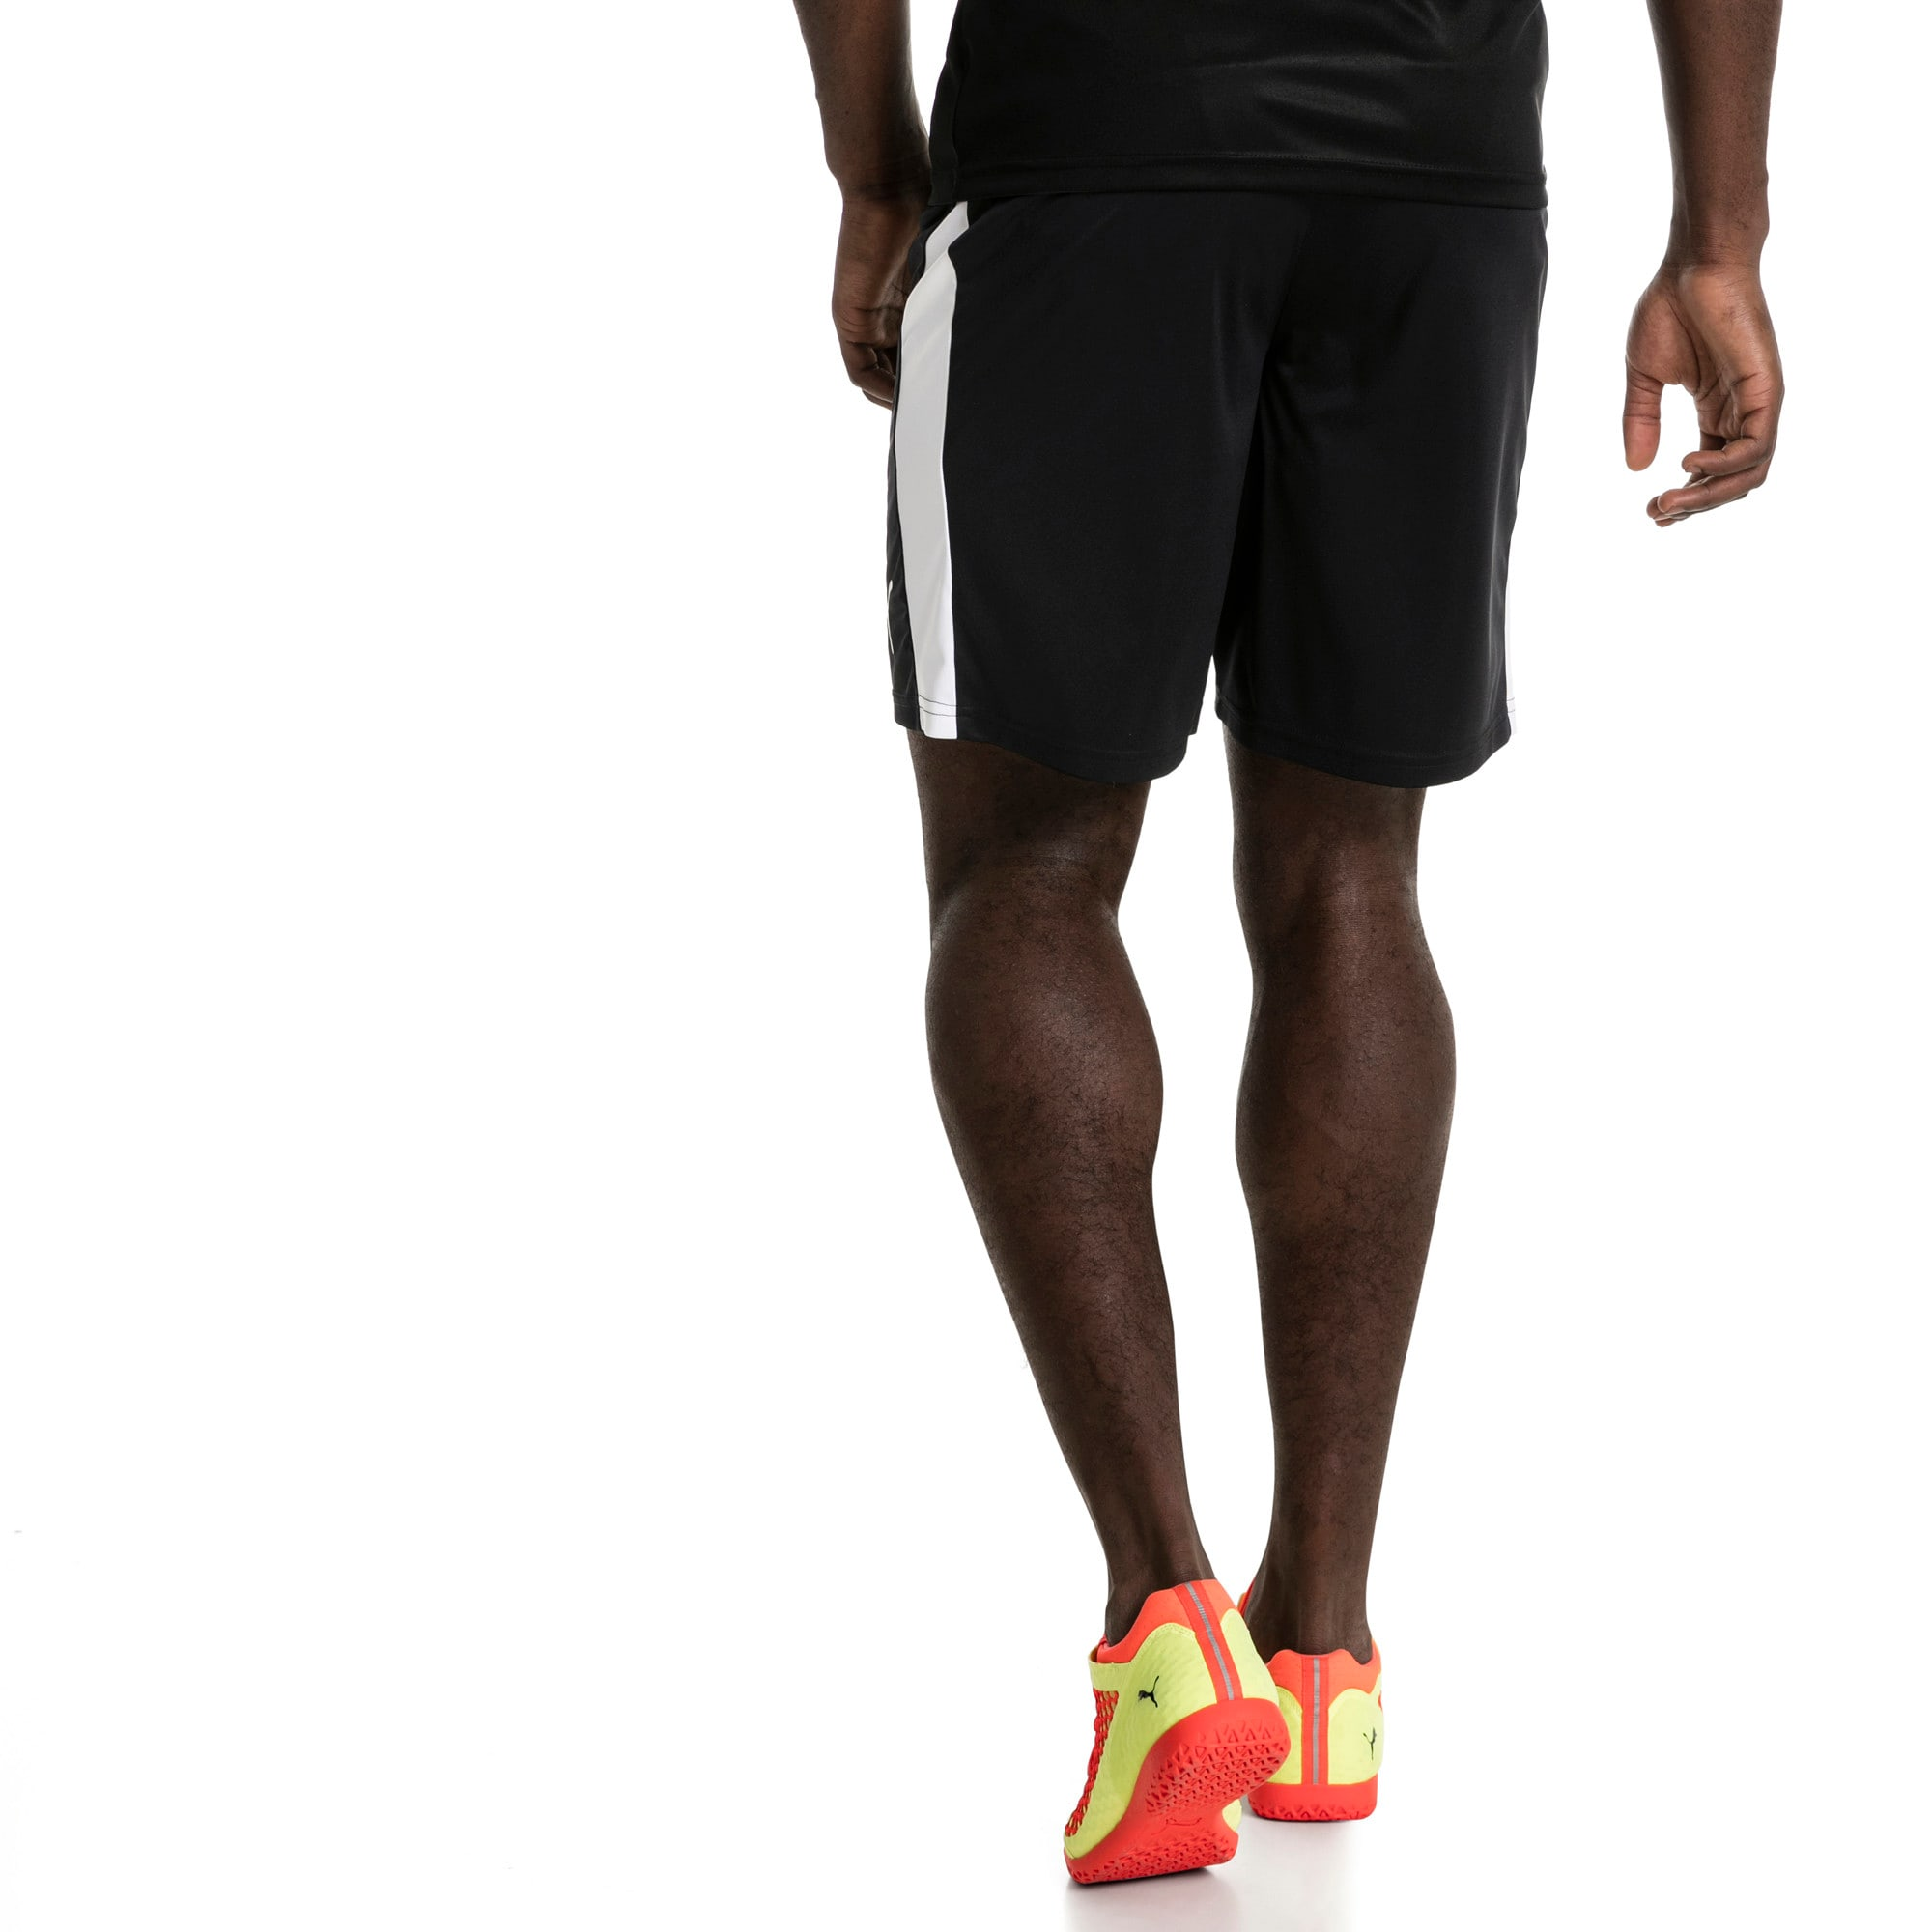 Thumbnail 3 of Liga Men's Shorts, Puma Black-Puma White, medium